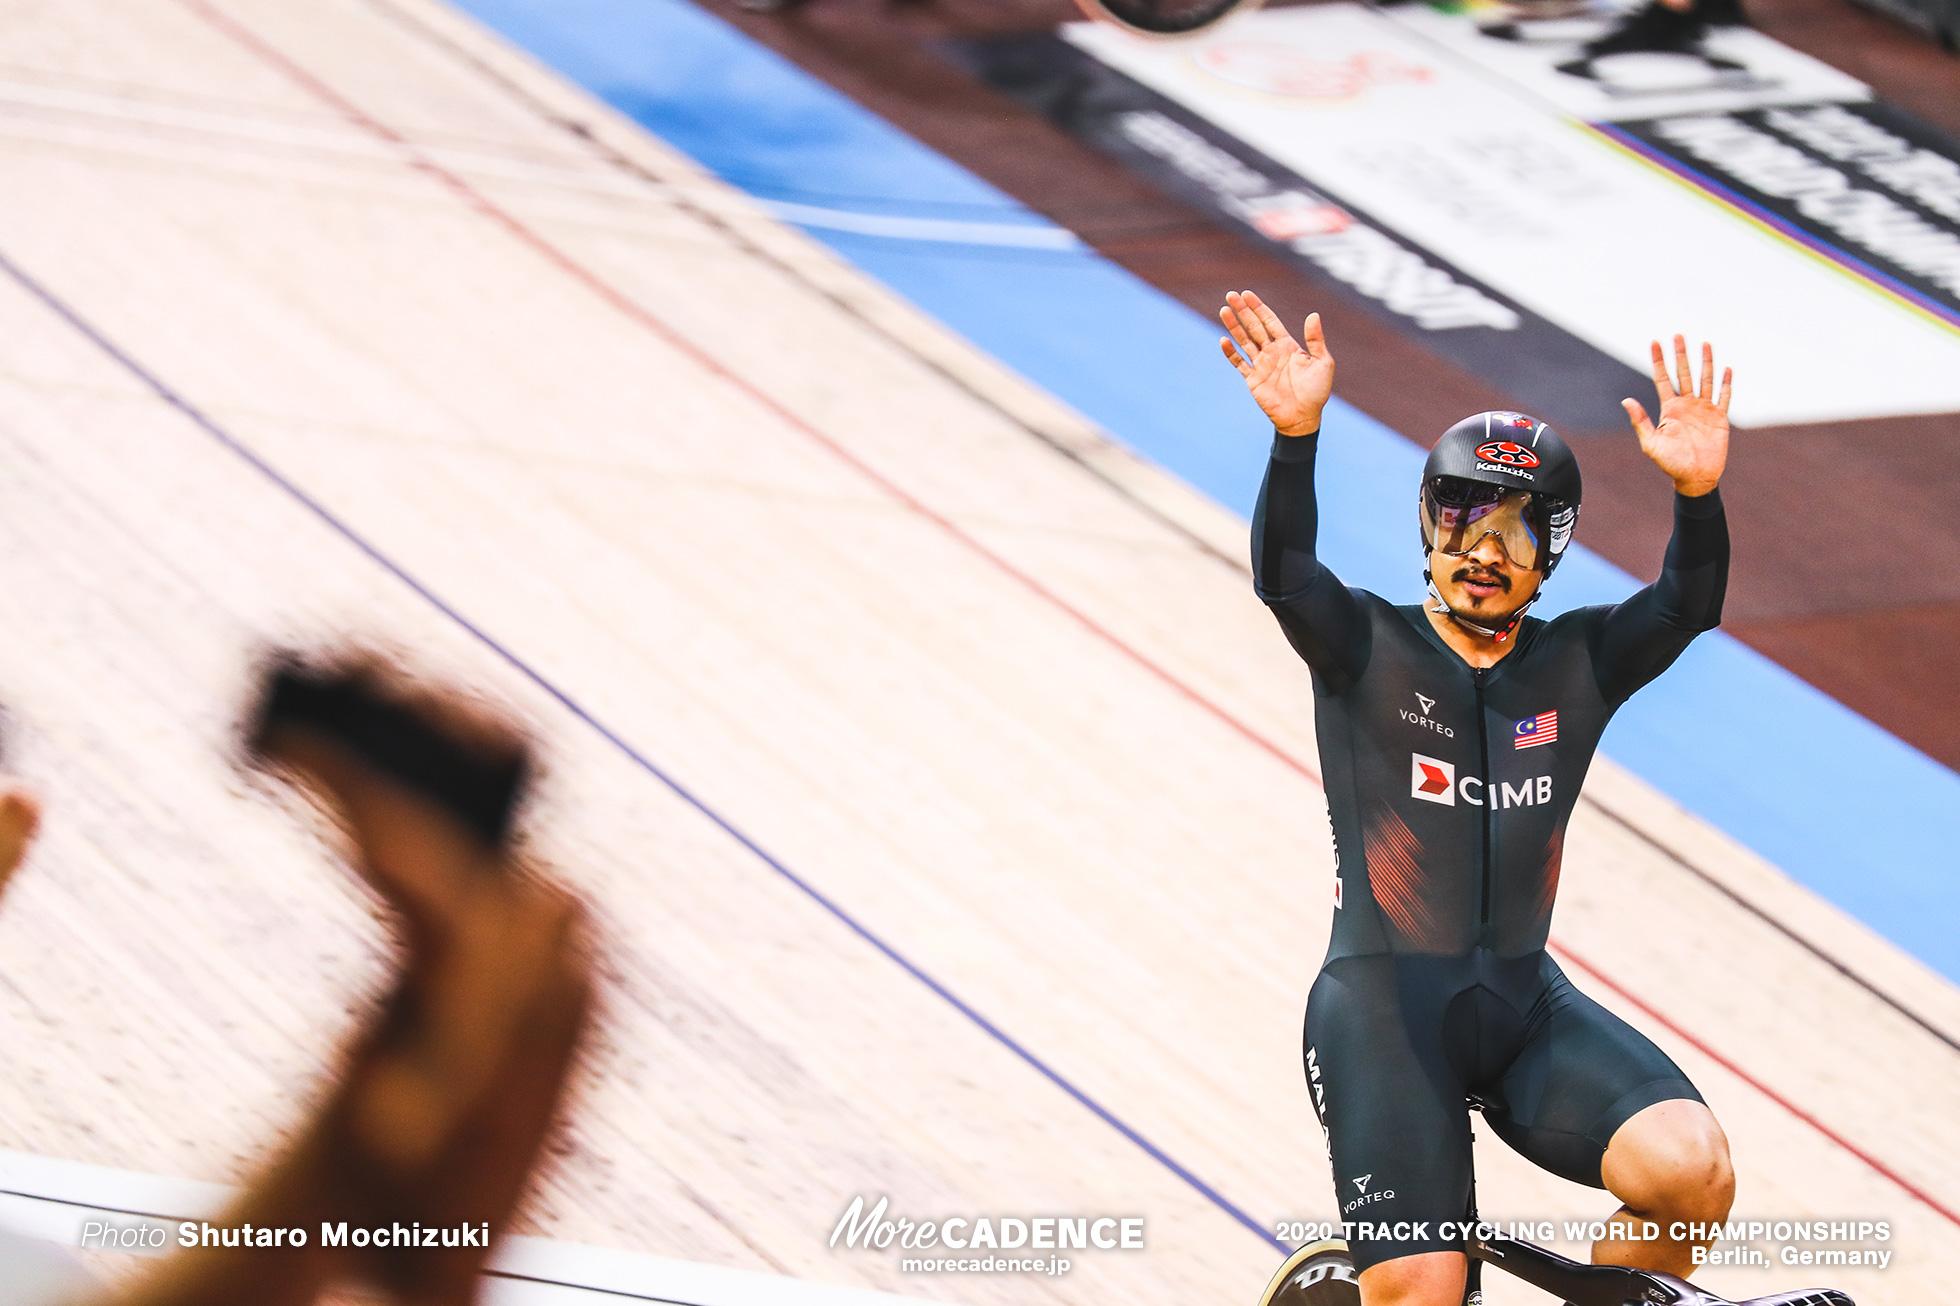 Final / Men's Sprint / 2020 Track Cycling World Championships, Azizulhasni Awang アジズルハスニ・アワン